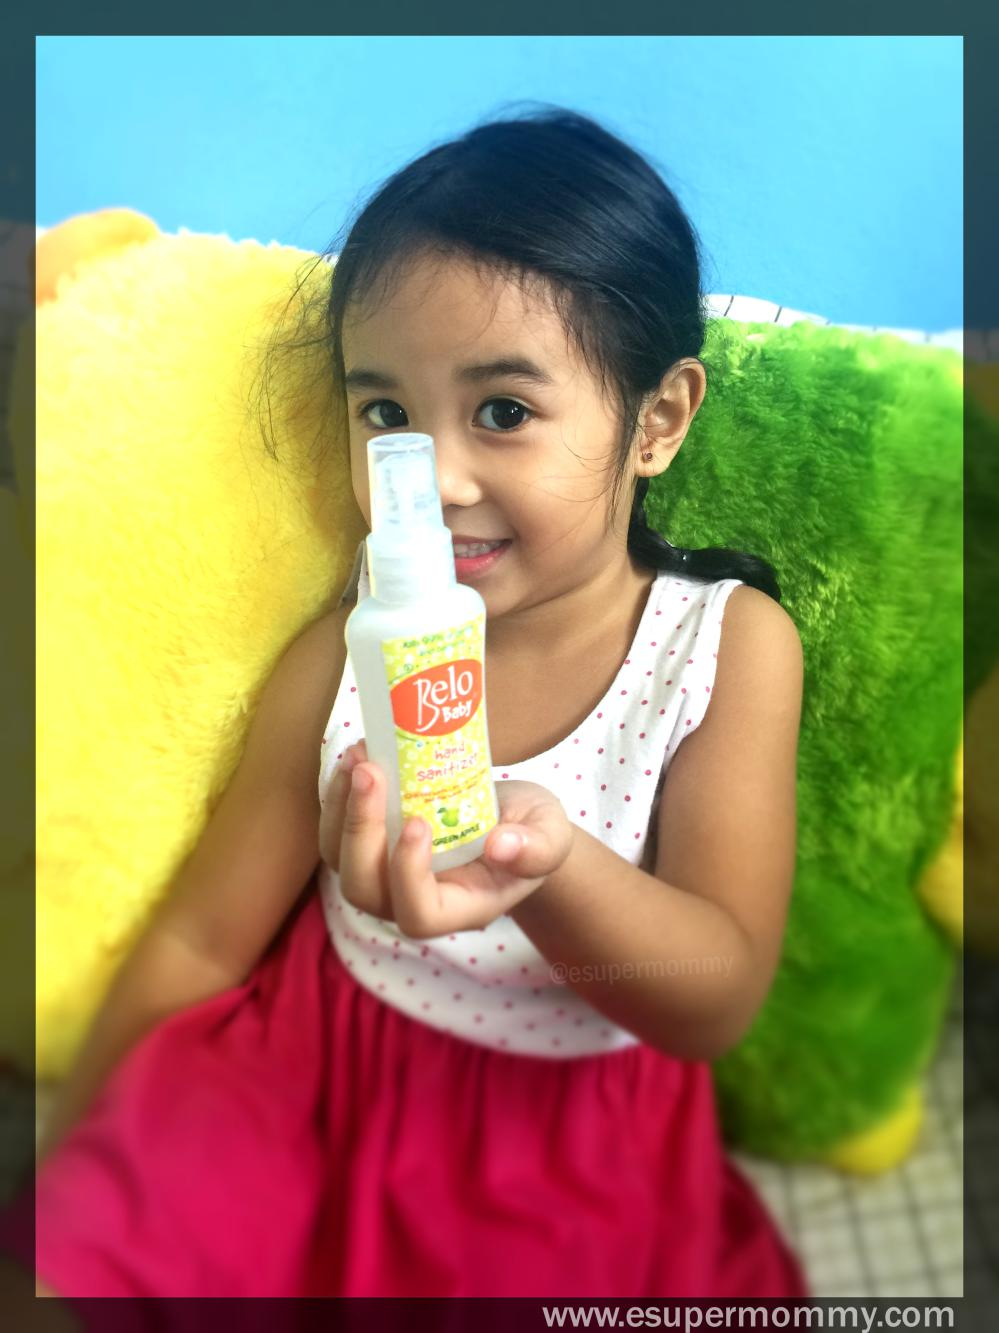 Belo Baby Sanitizers Details